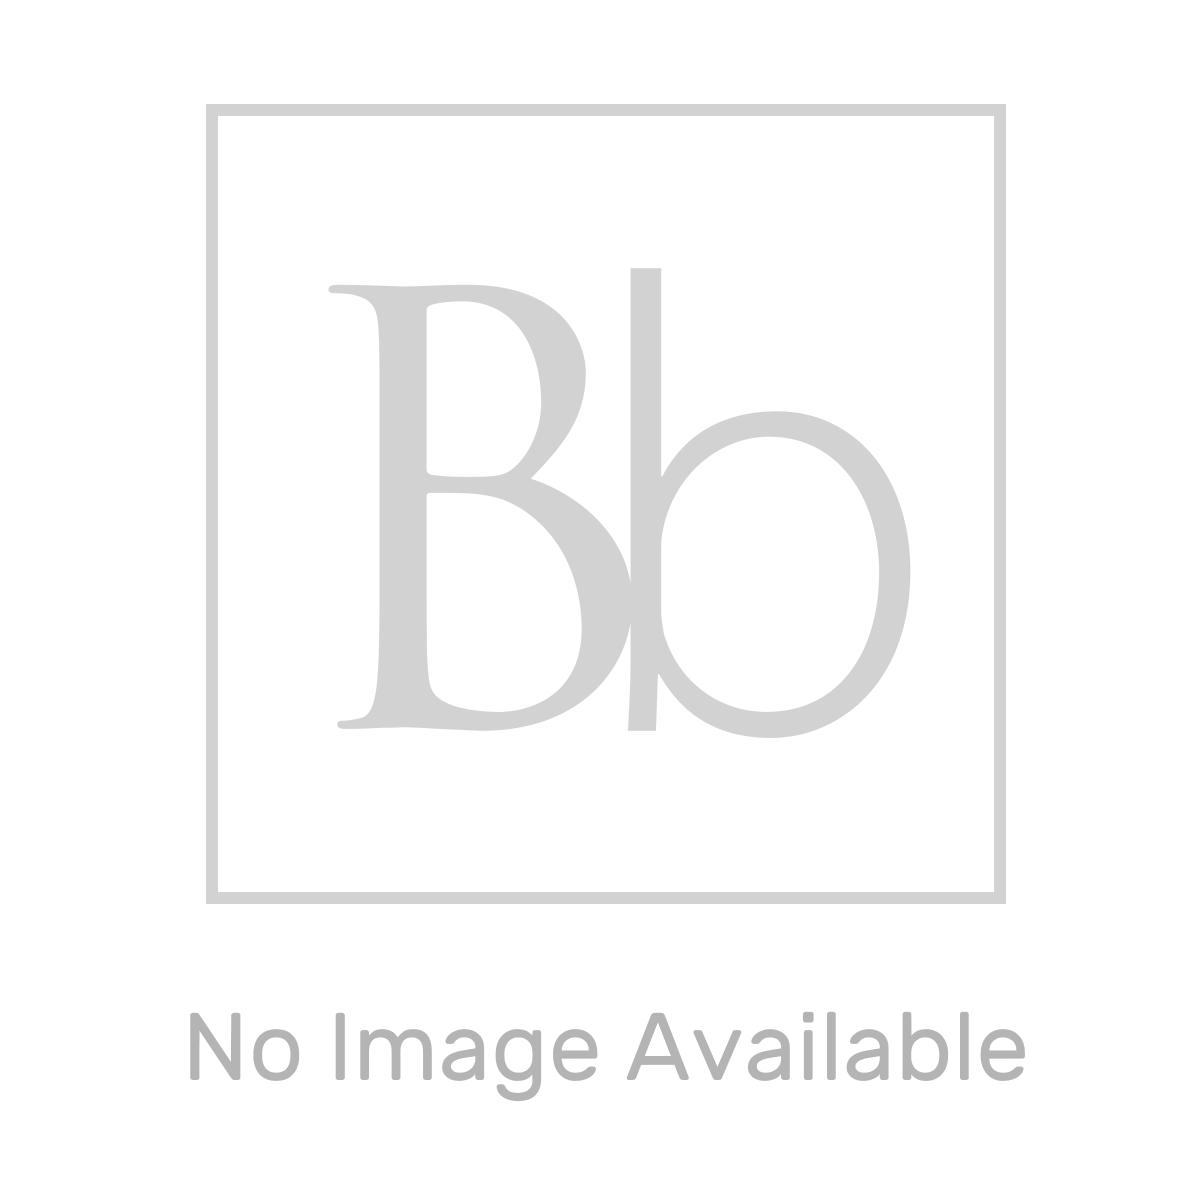 Ceramic 50mm Profile Basin